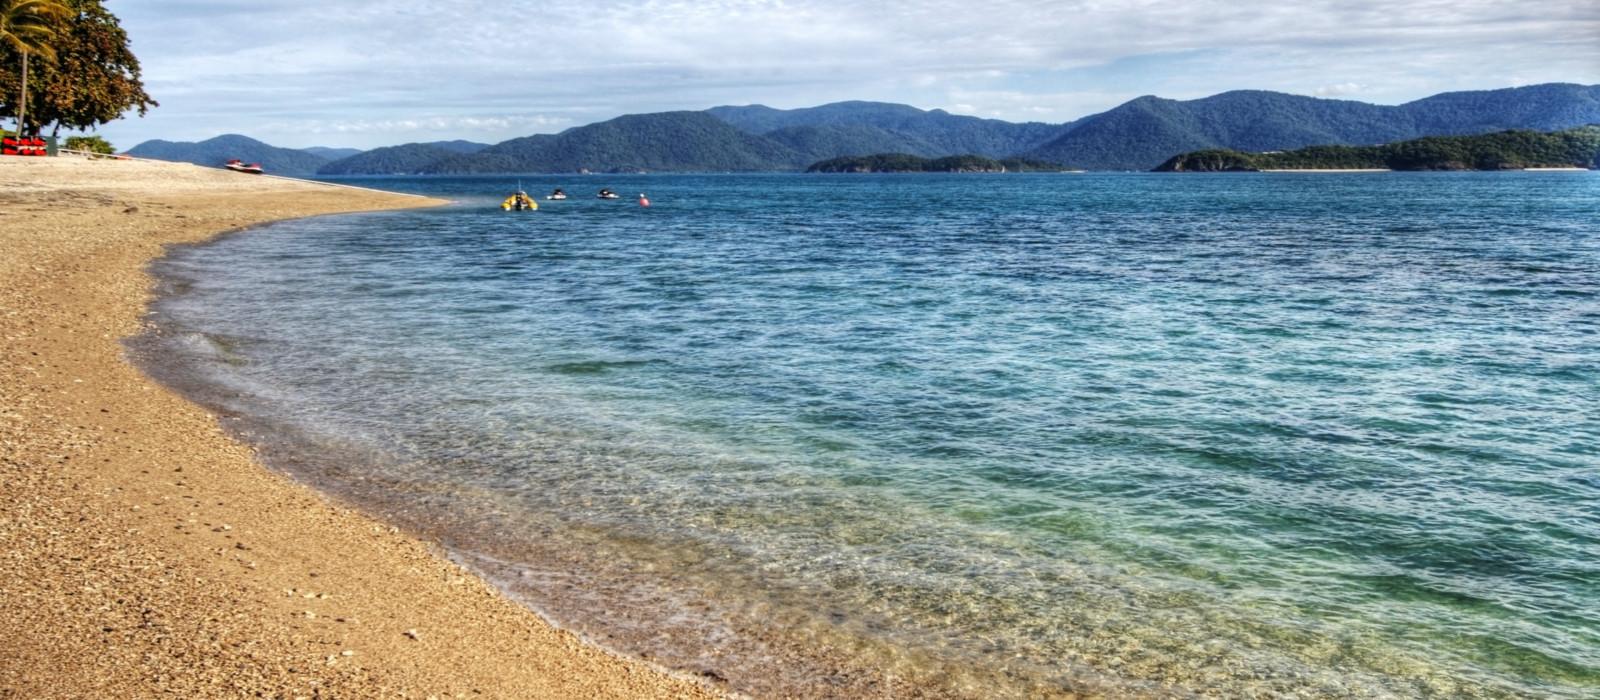 Destination Daydream Island Australia